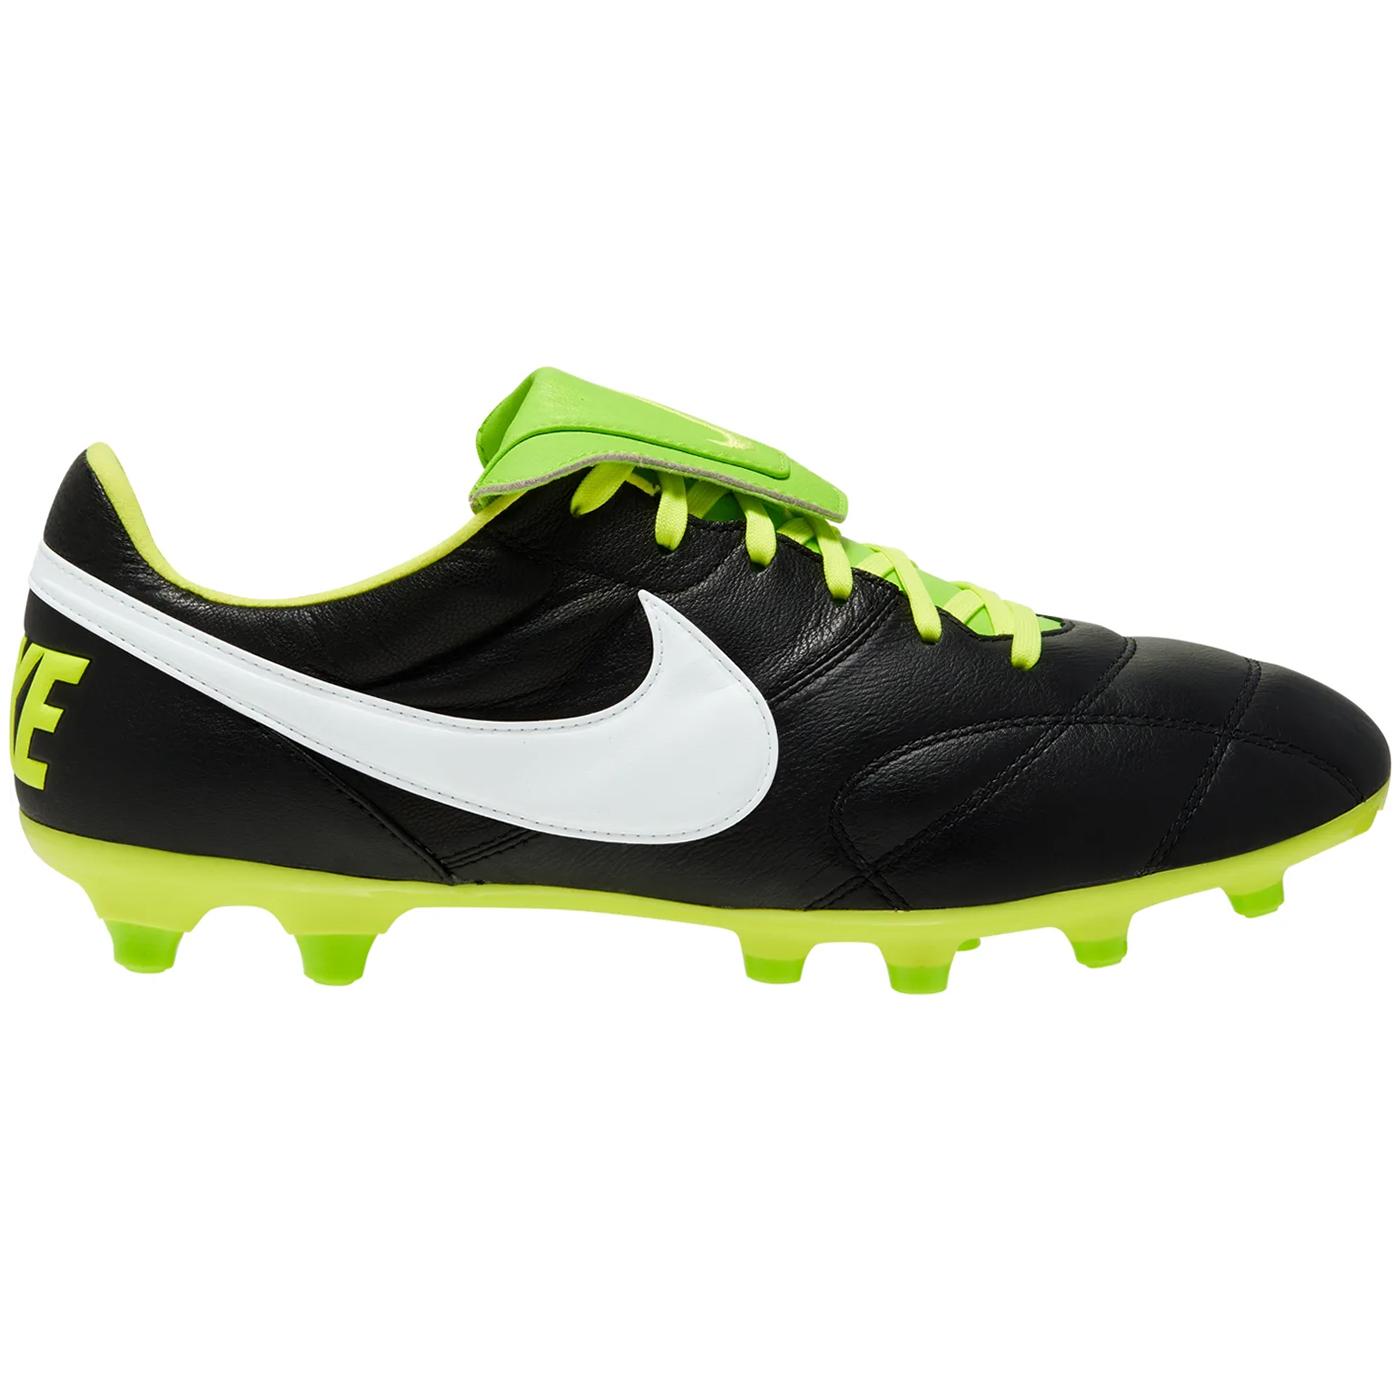 The Nike Premier II FG Fußballschuhe schwarz grün 917803 013